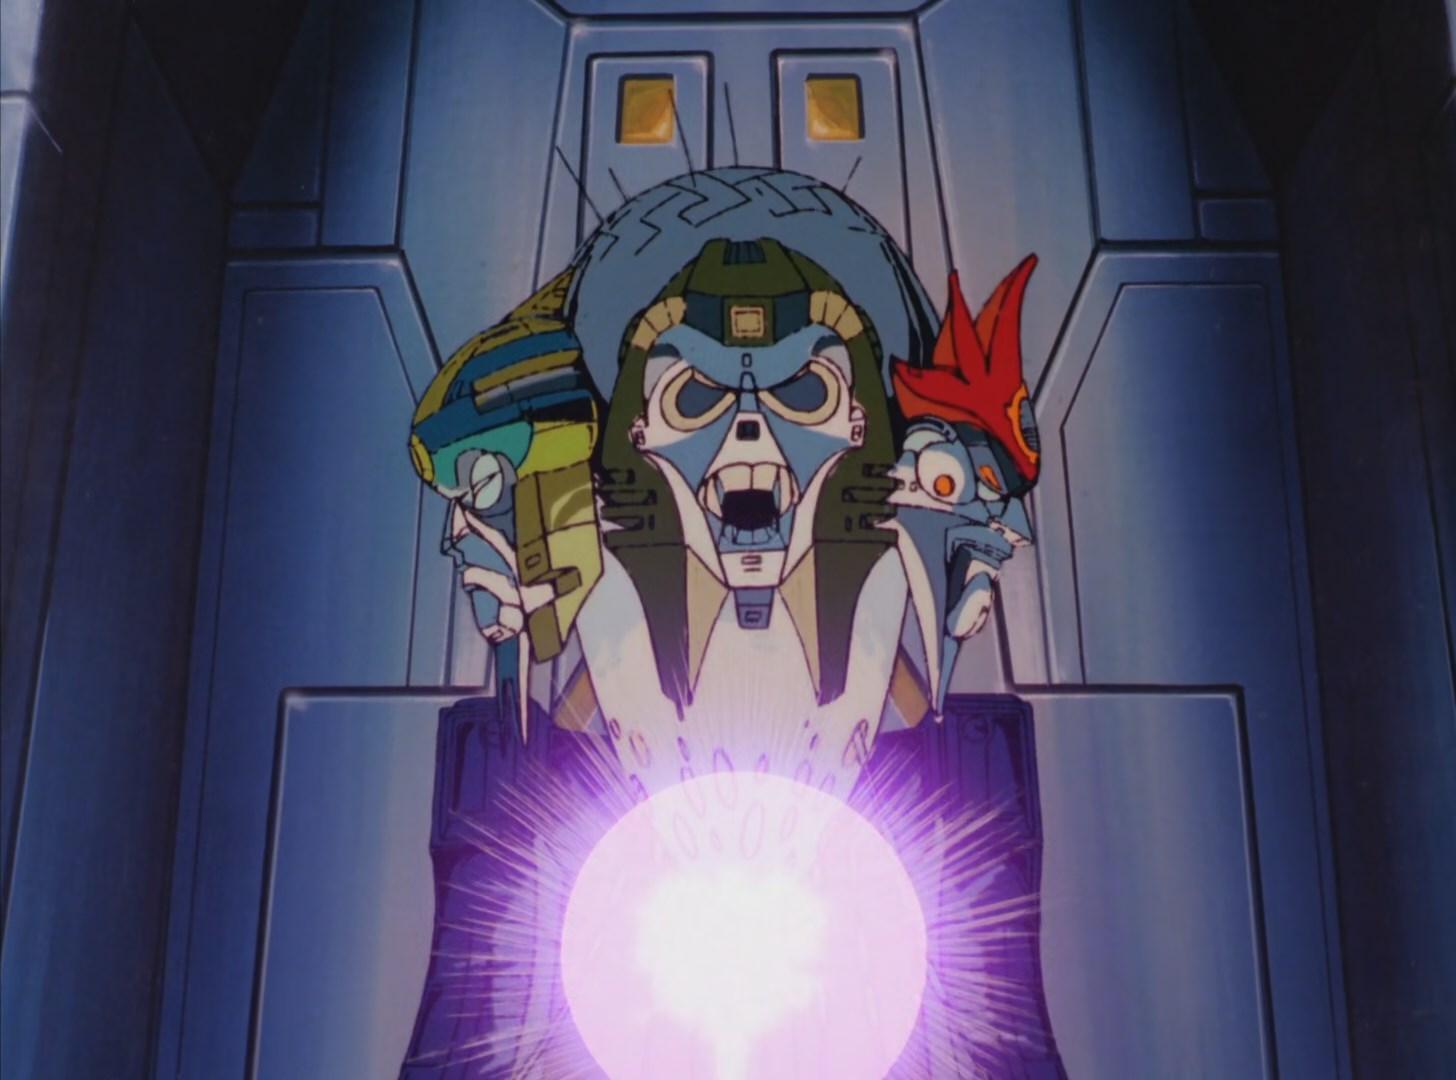 The Quintessons. Malevolent creators of the Transformers.